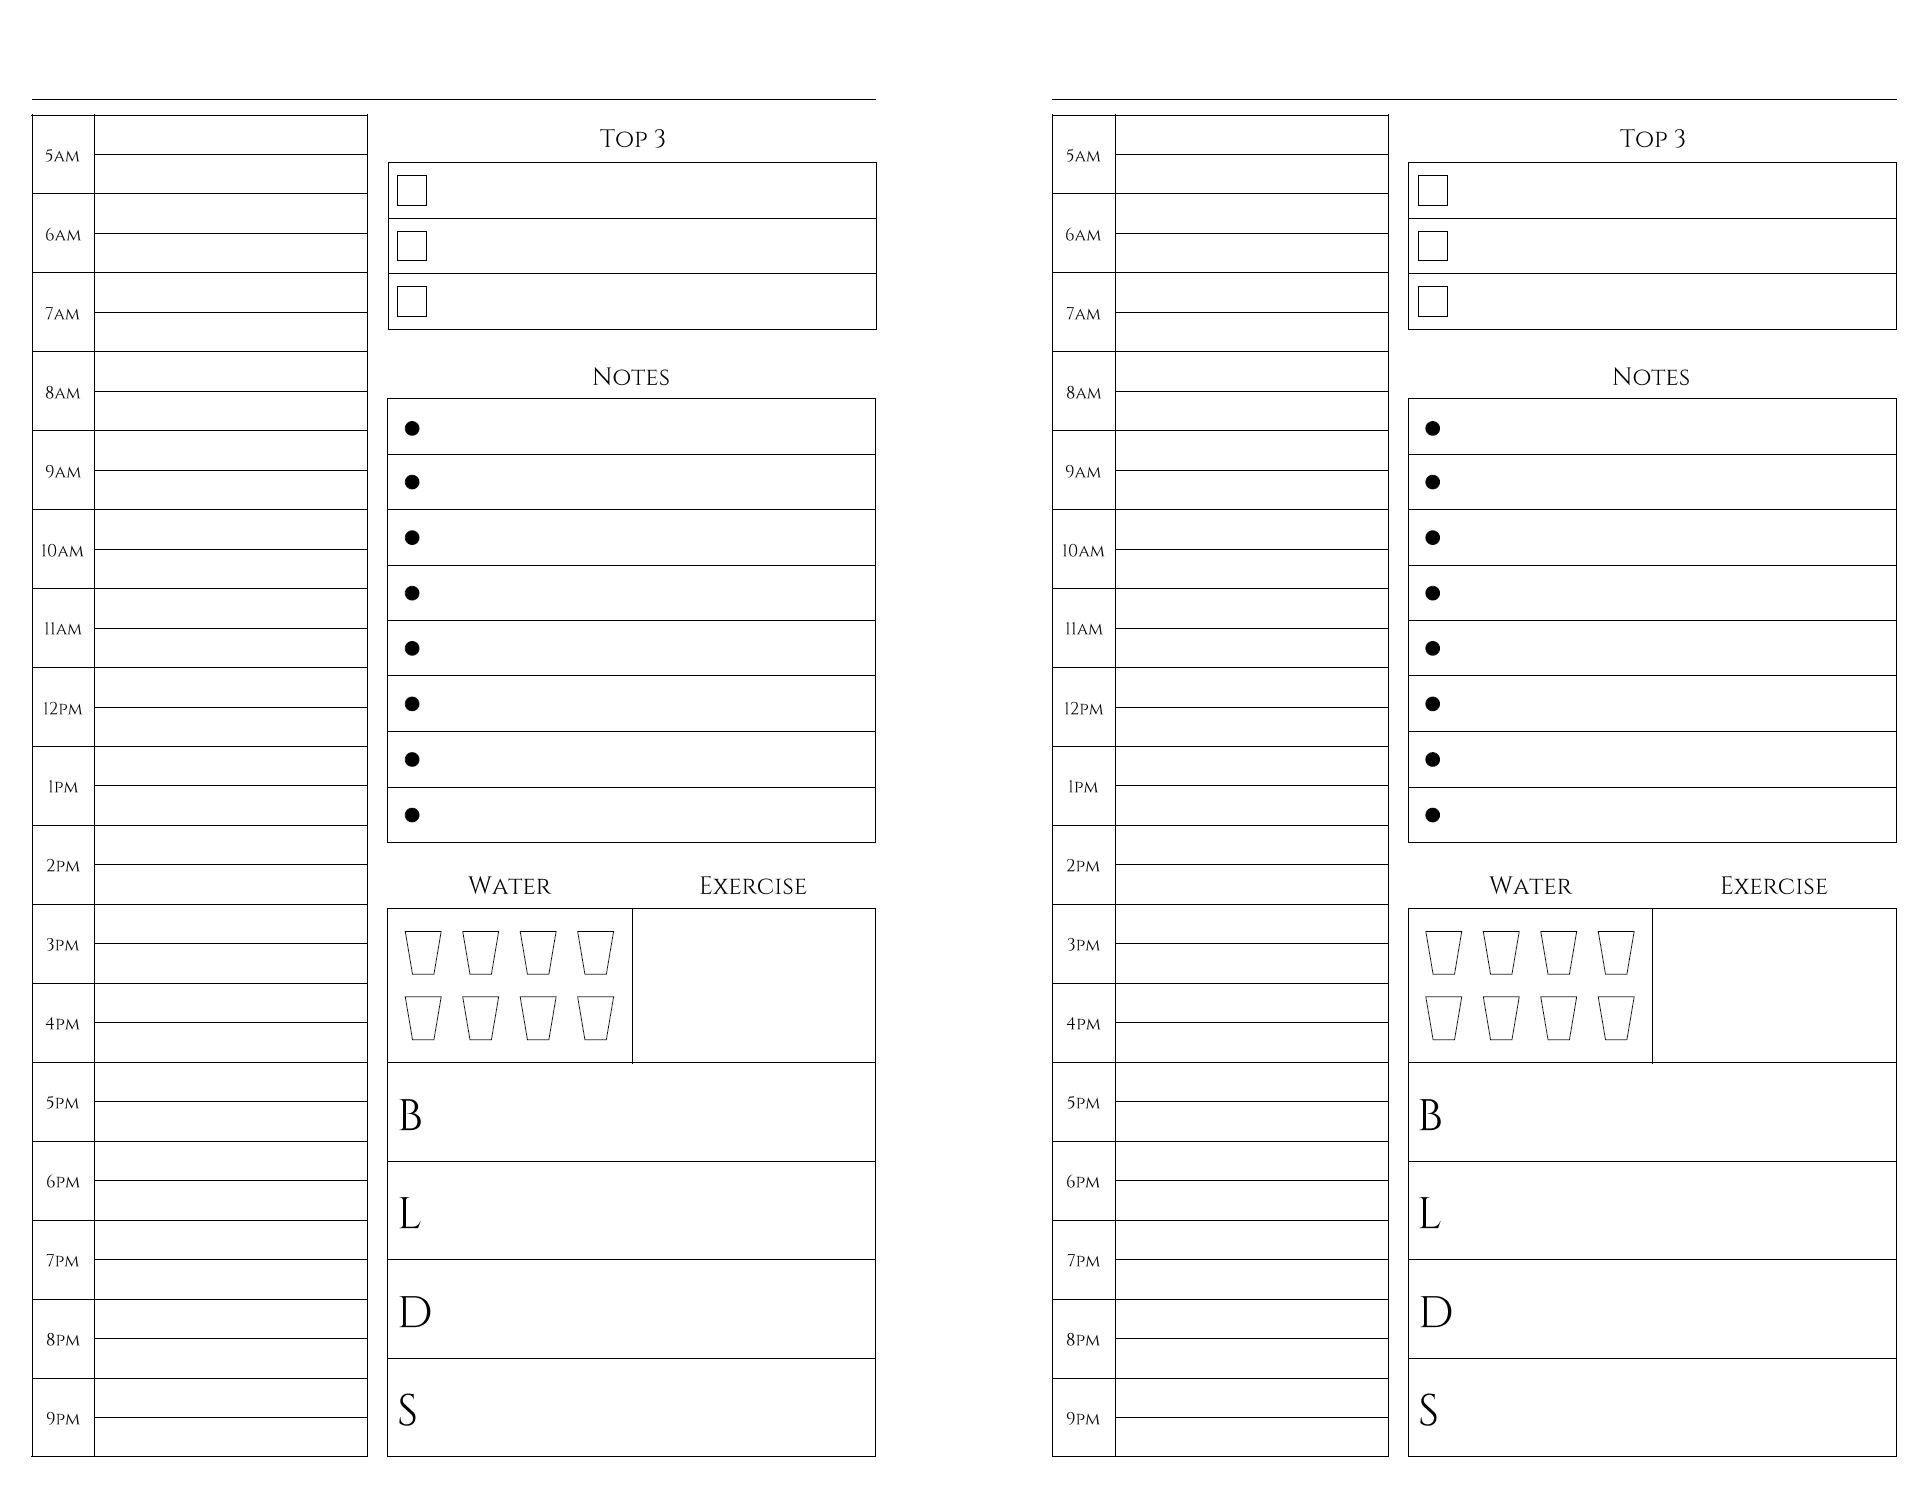 Free Printables | Weekly Planner Printable, Daily Planner Daily Planner Printable Editable Free 8.5 X 5.5